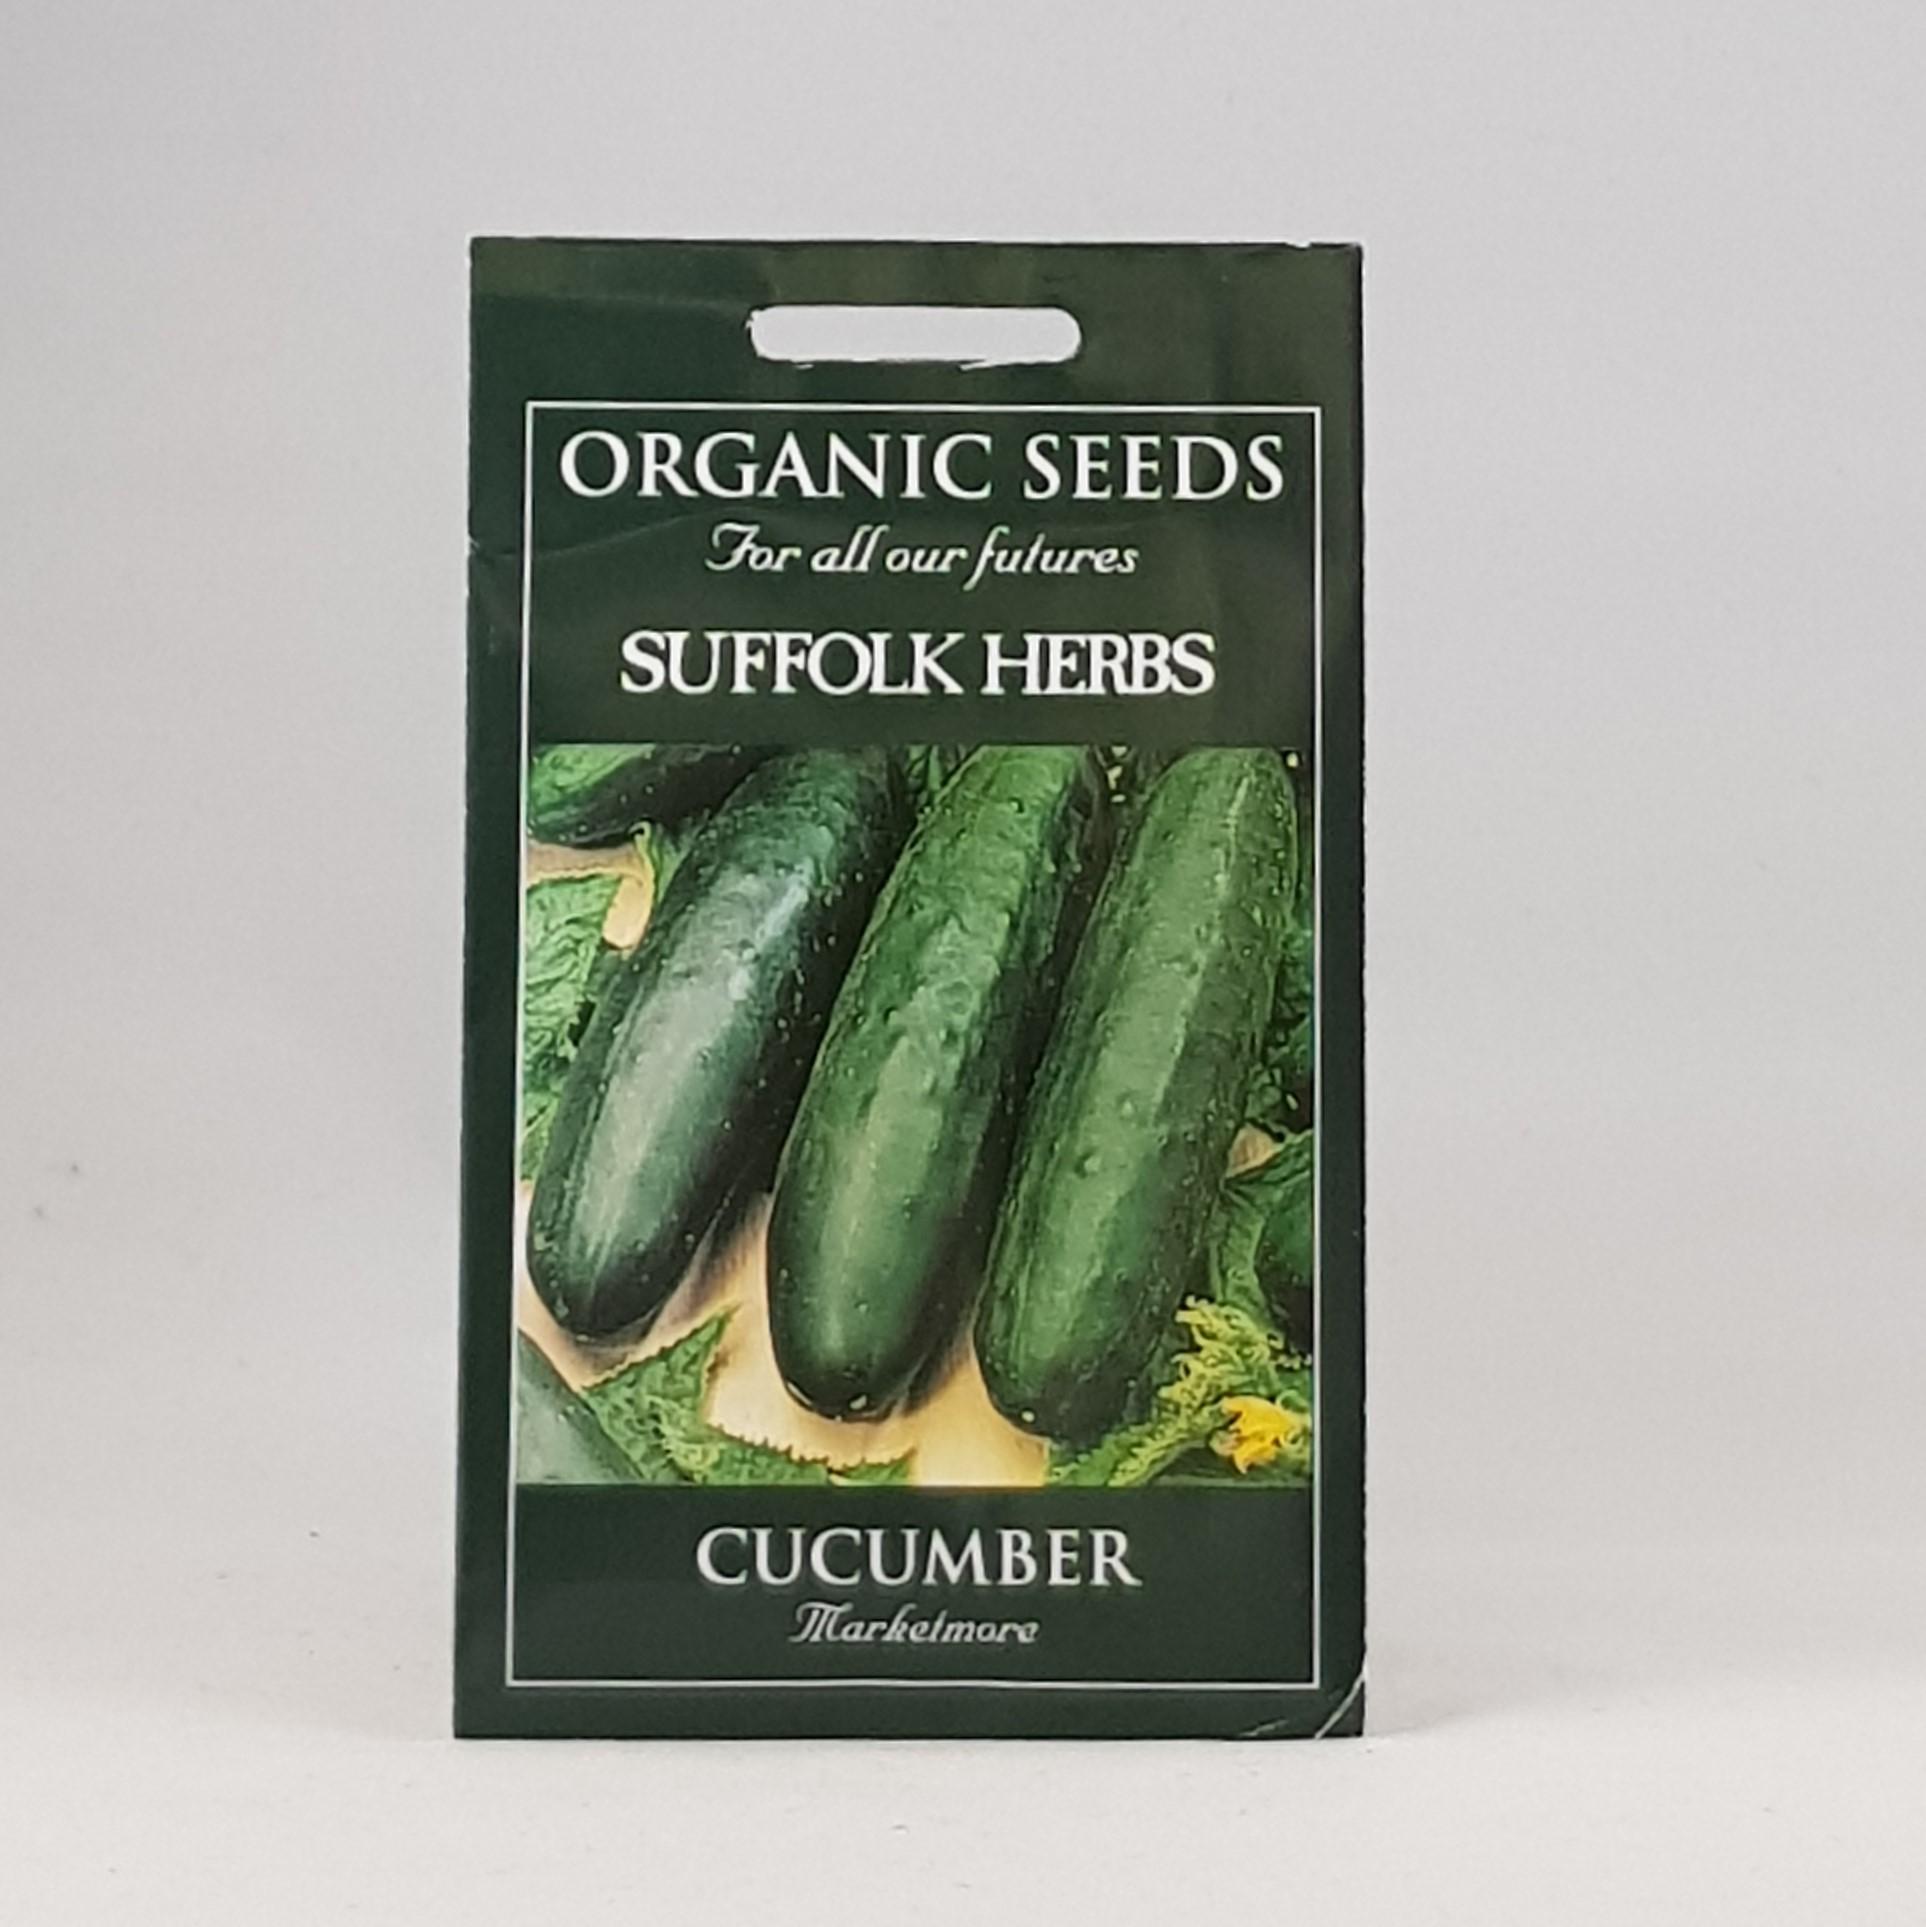 Cucumber Marketmore Seeds, Organic